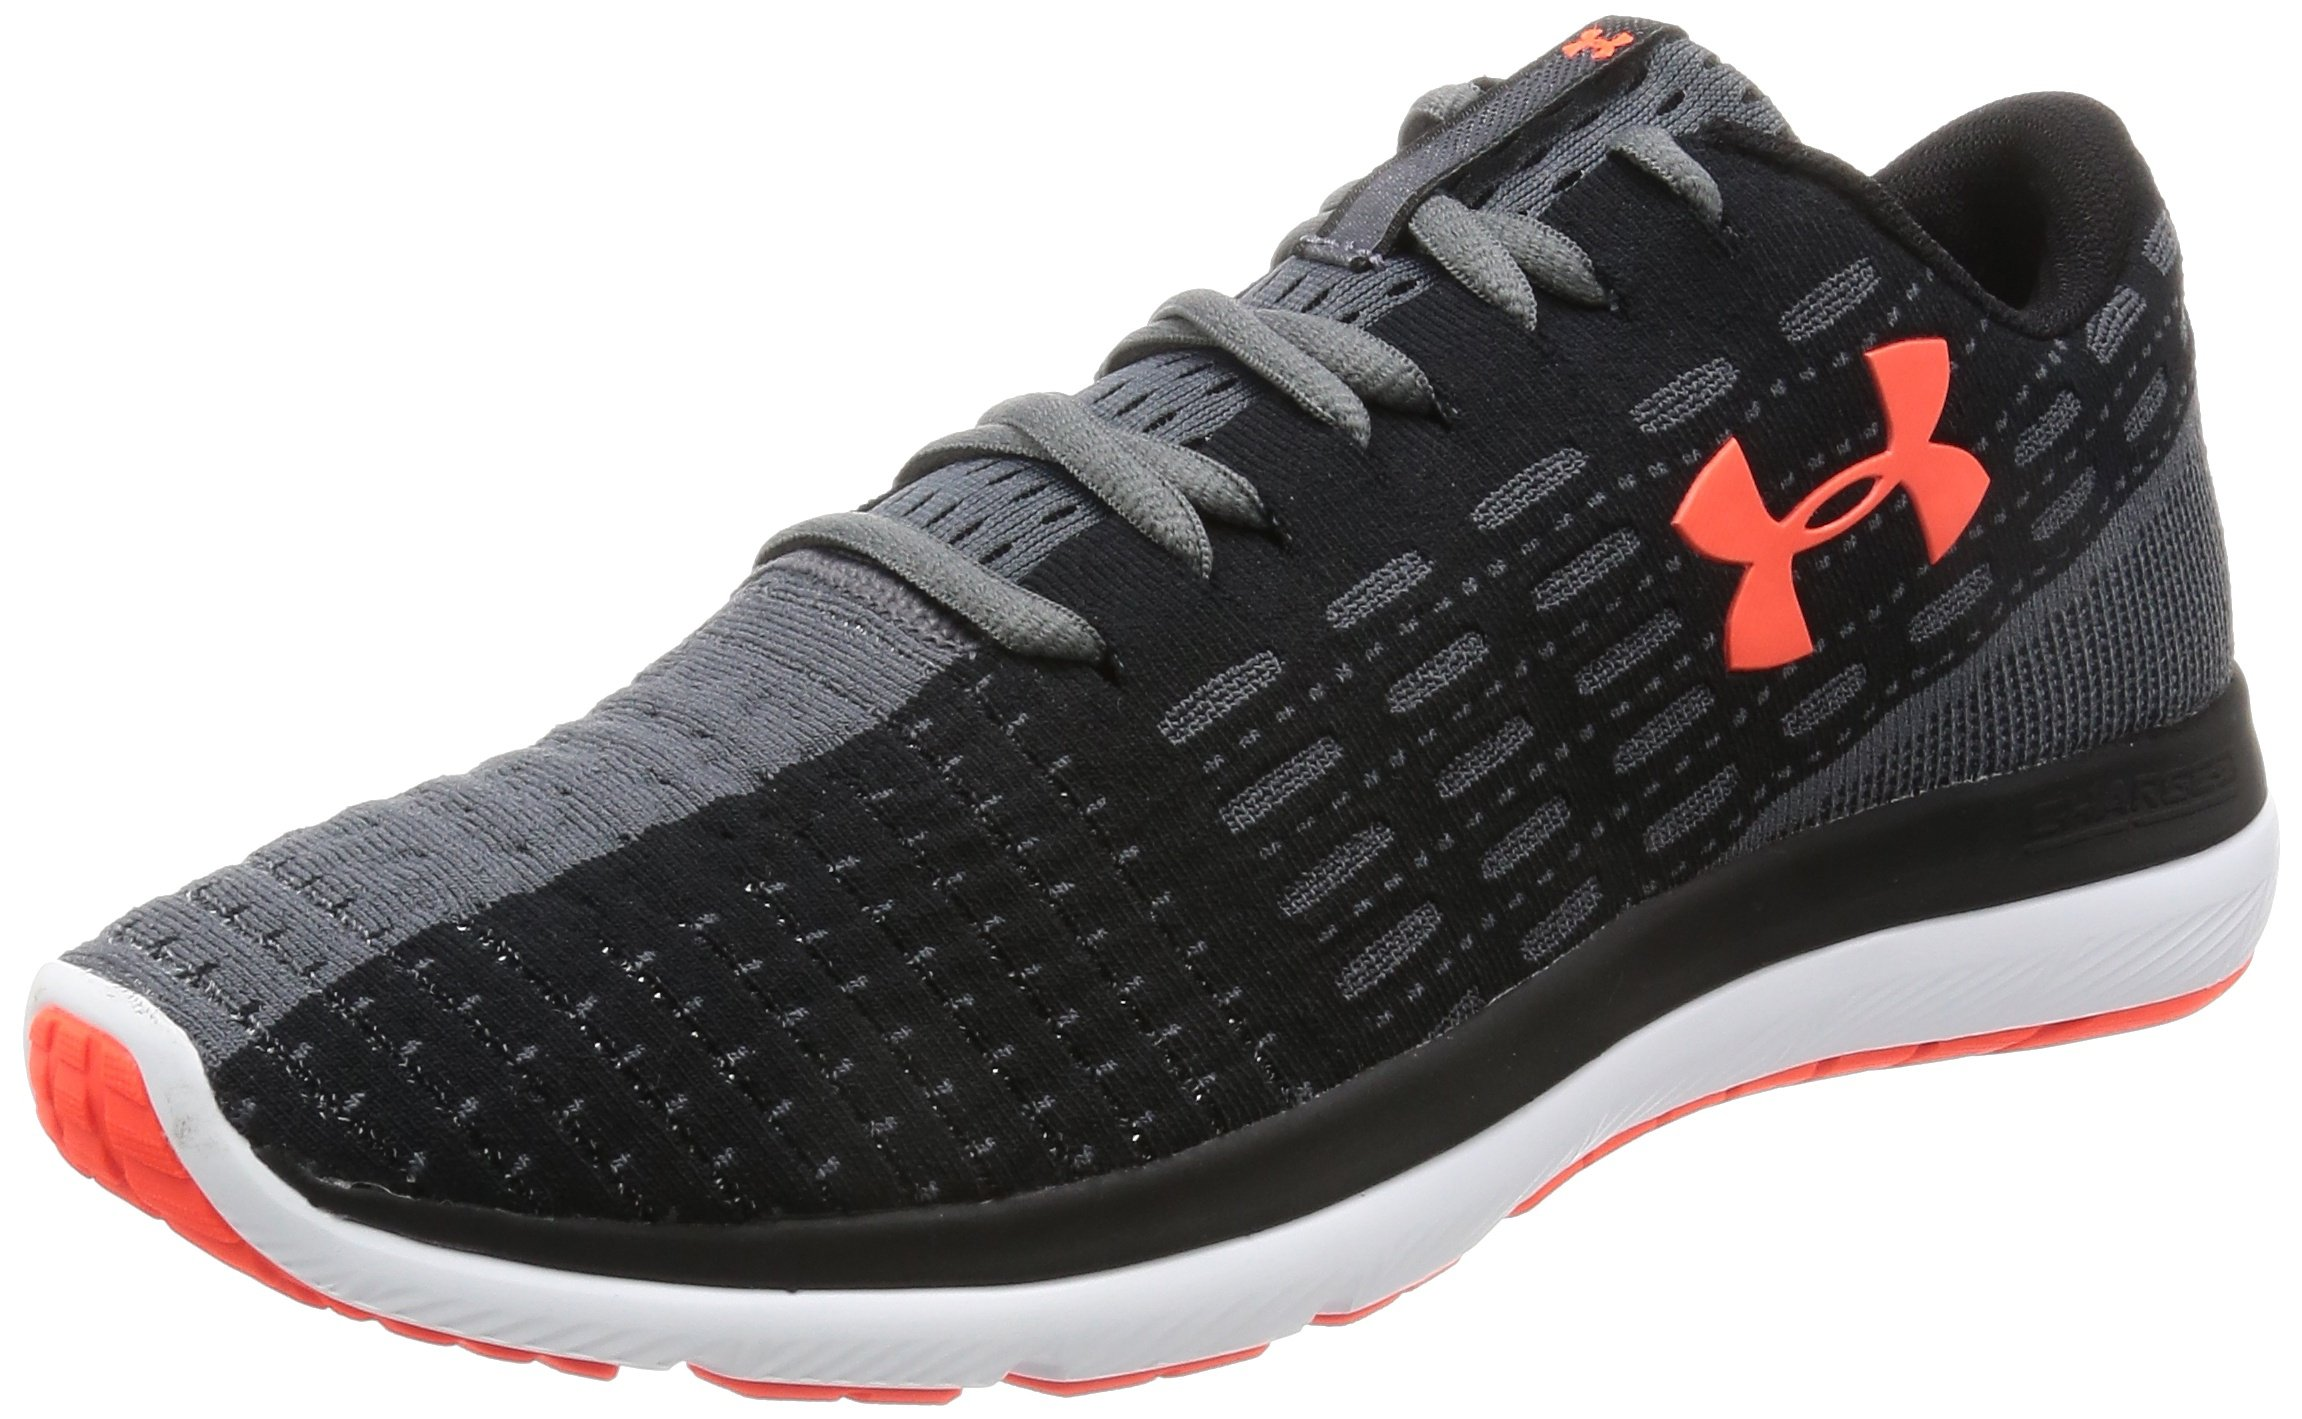 Slingflex Running Shoes